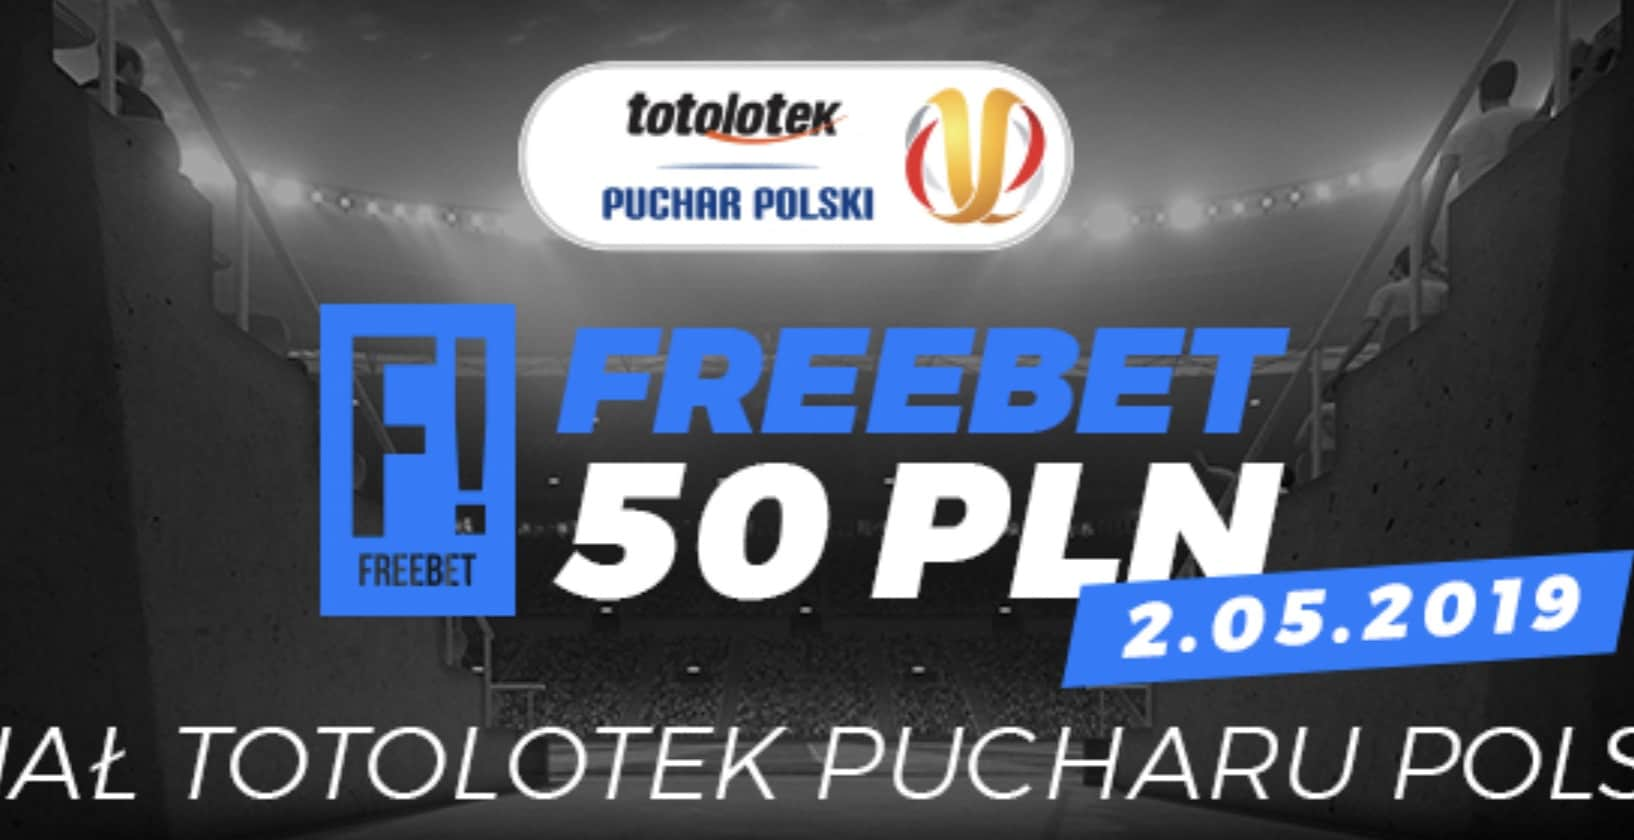 Photo of Freebet Totolotek Puchar Polski. 50 PLN dla wszystkich!